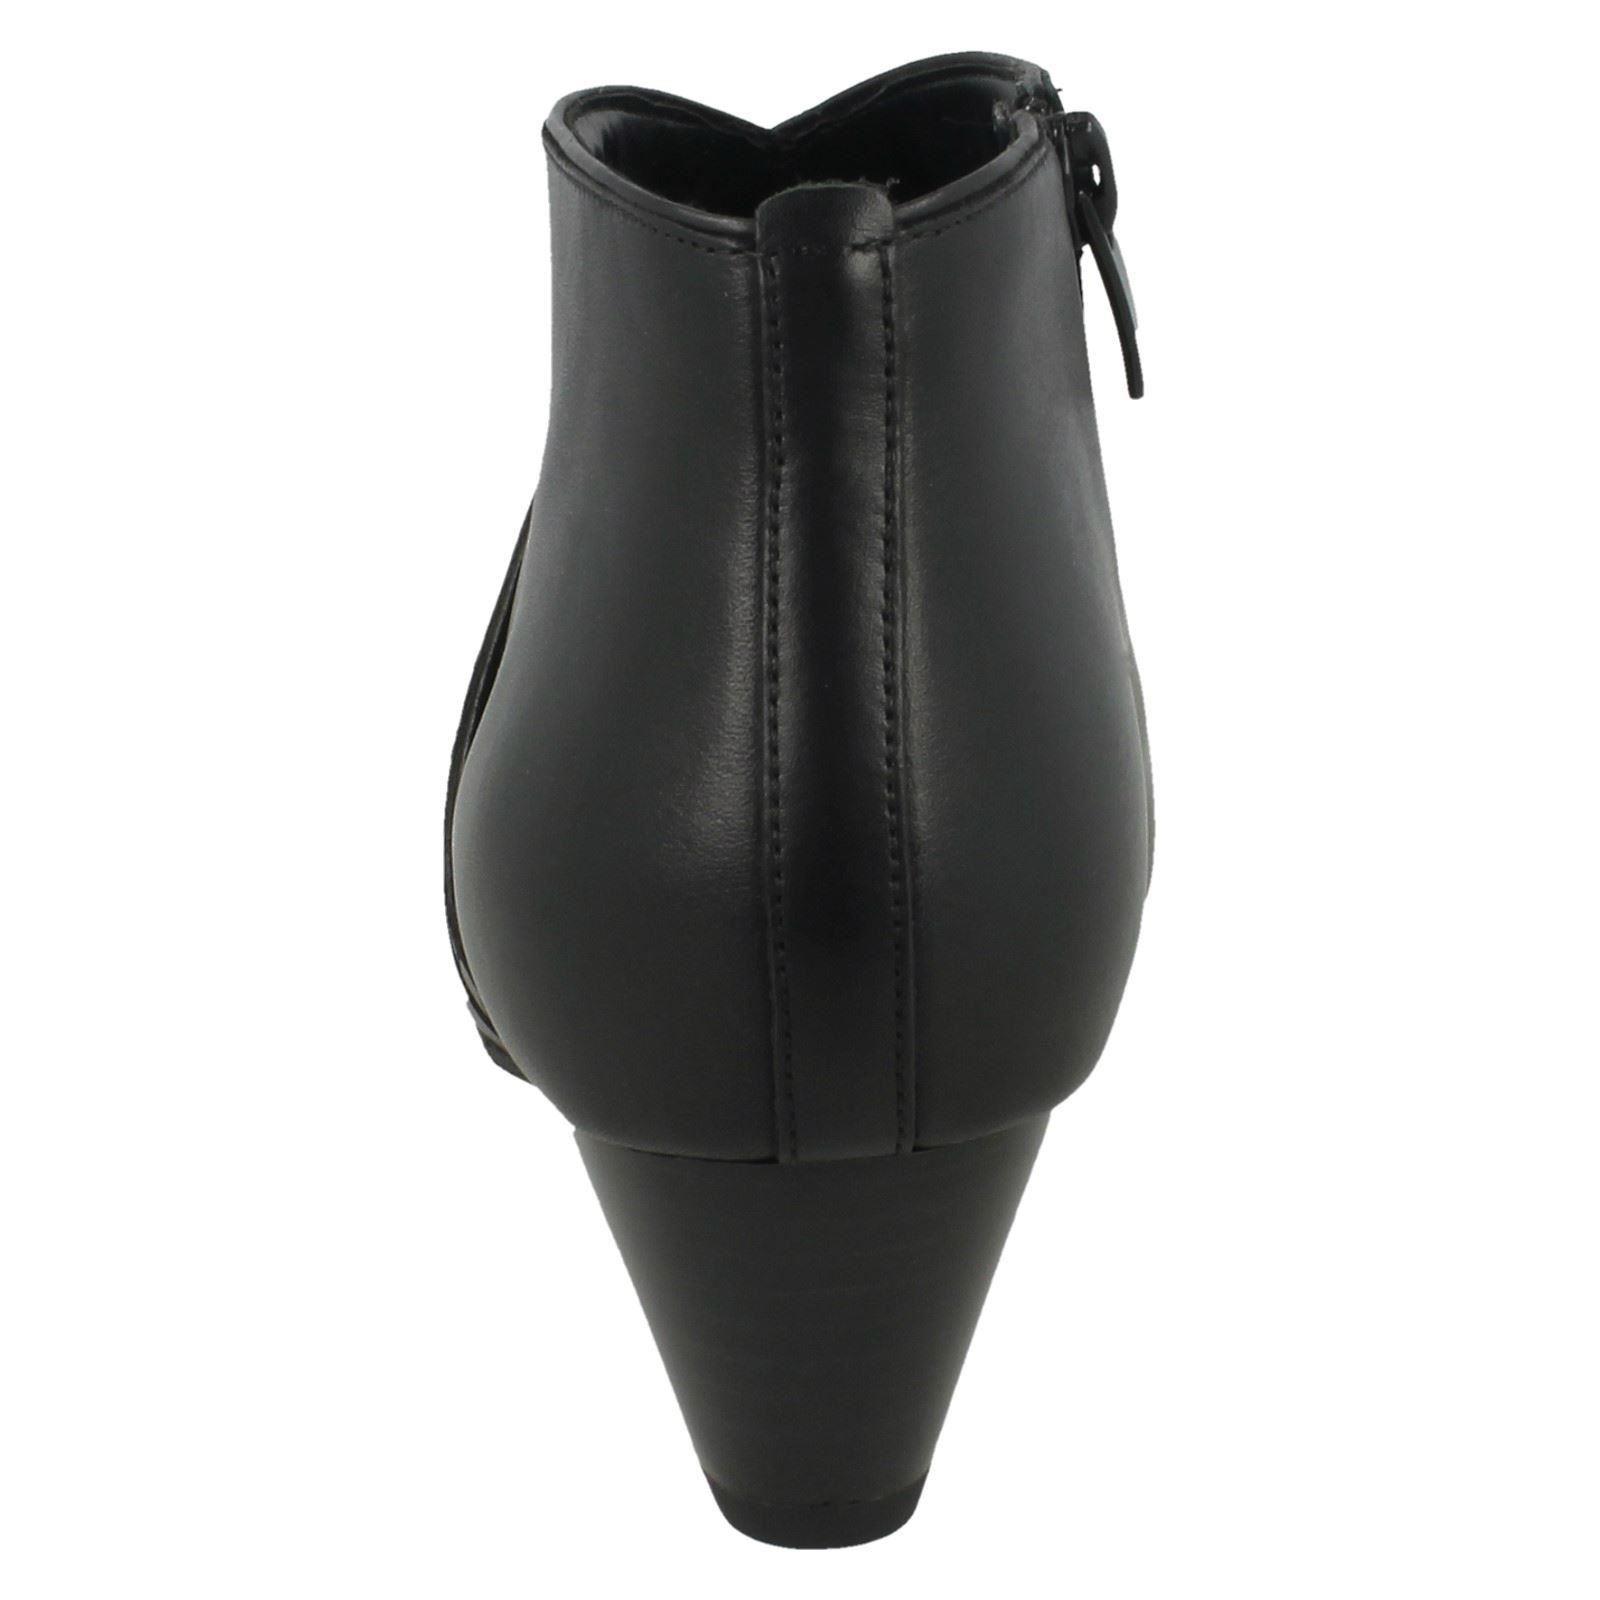 Clarks Ladies Ankle Boots Denny Frances